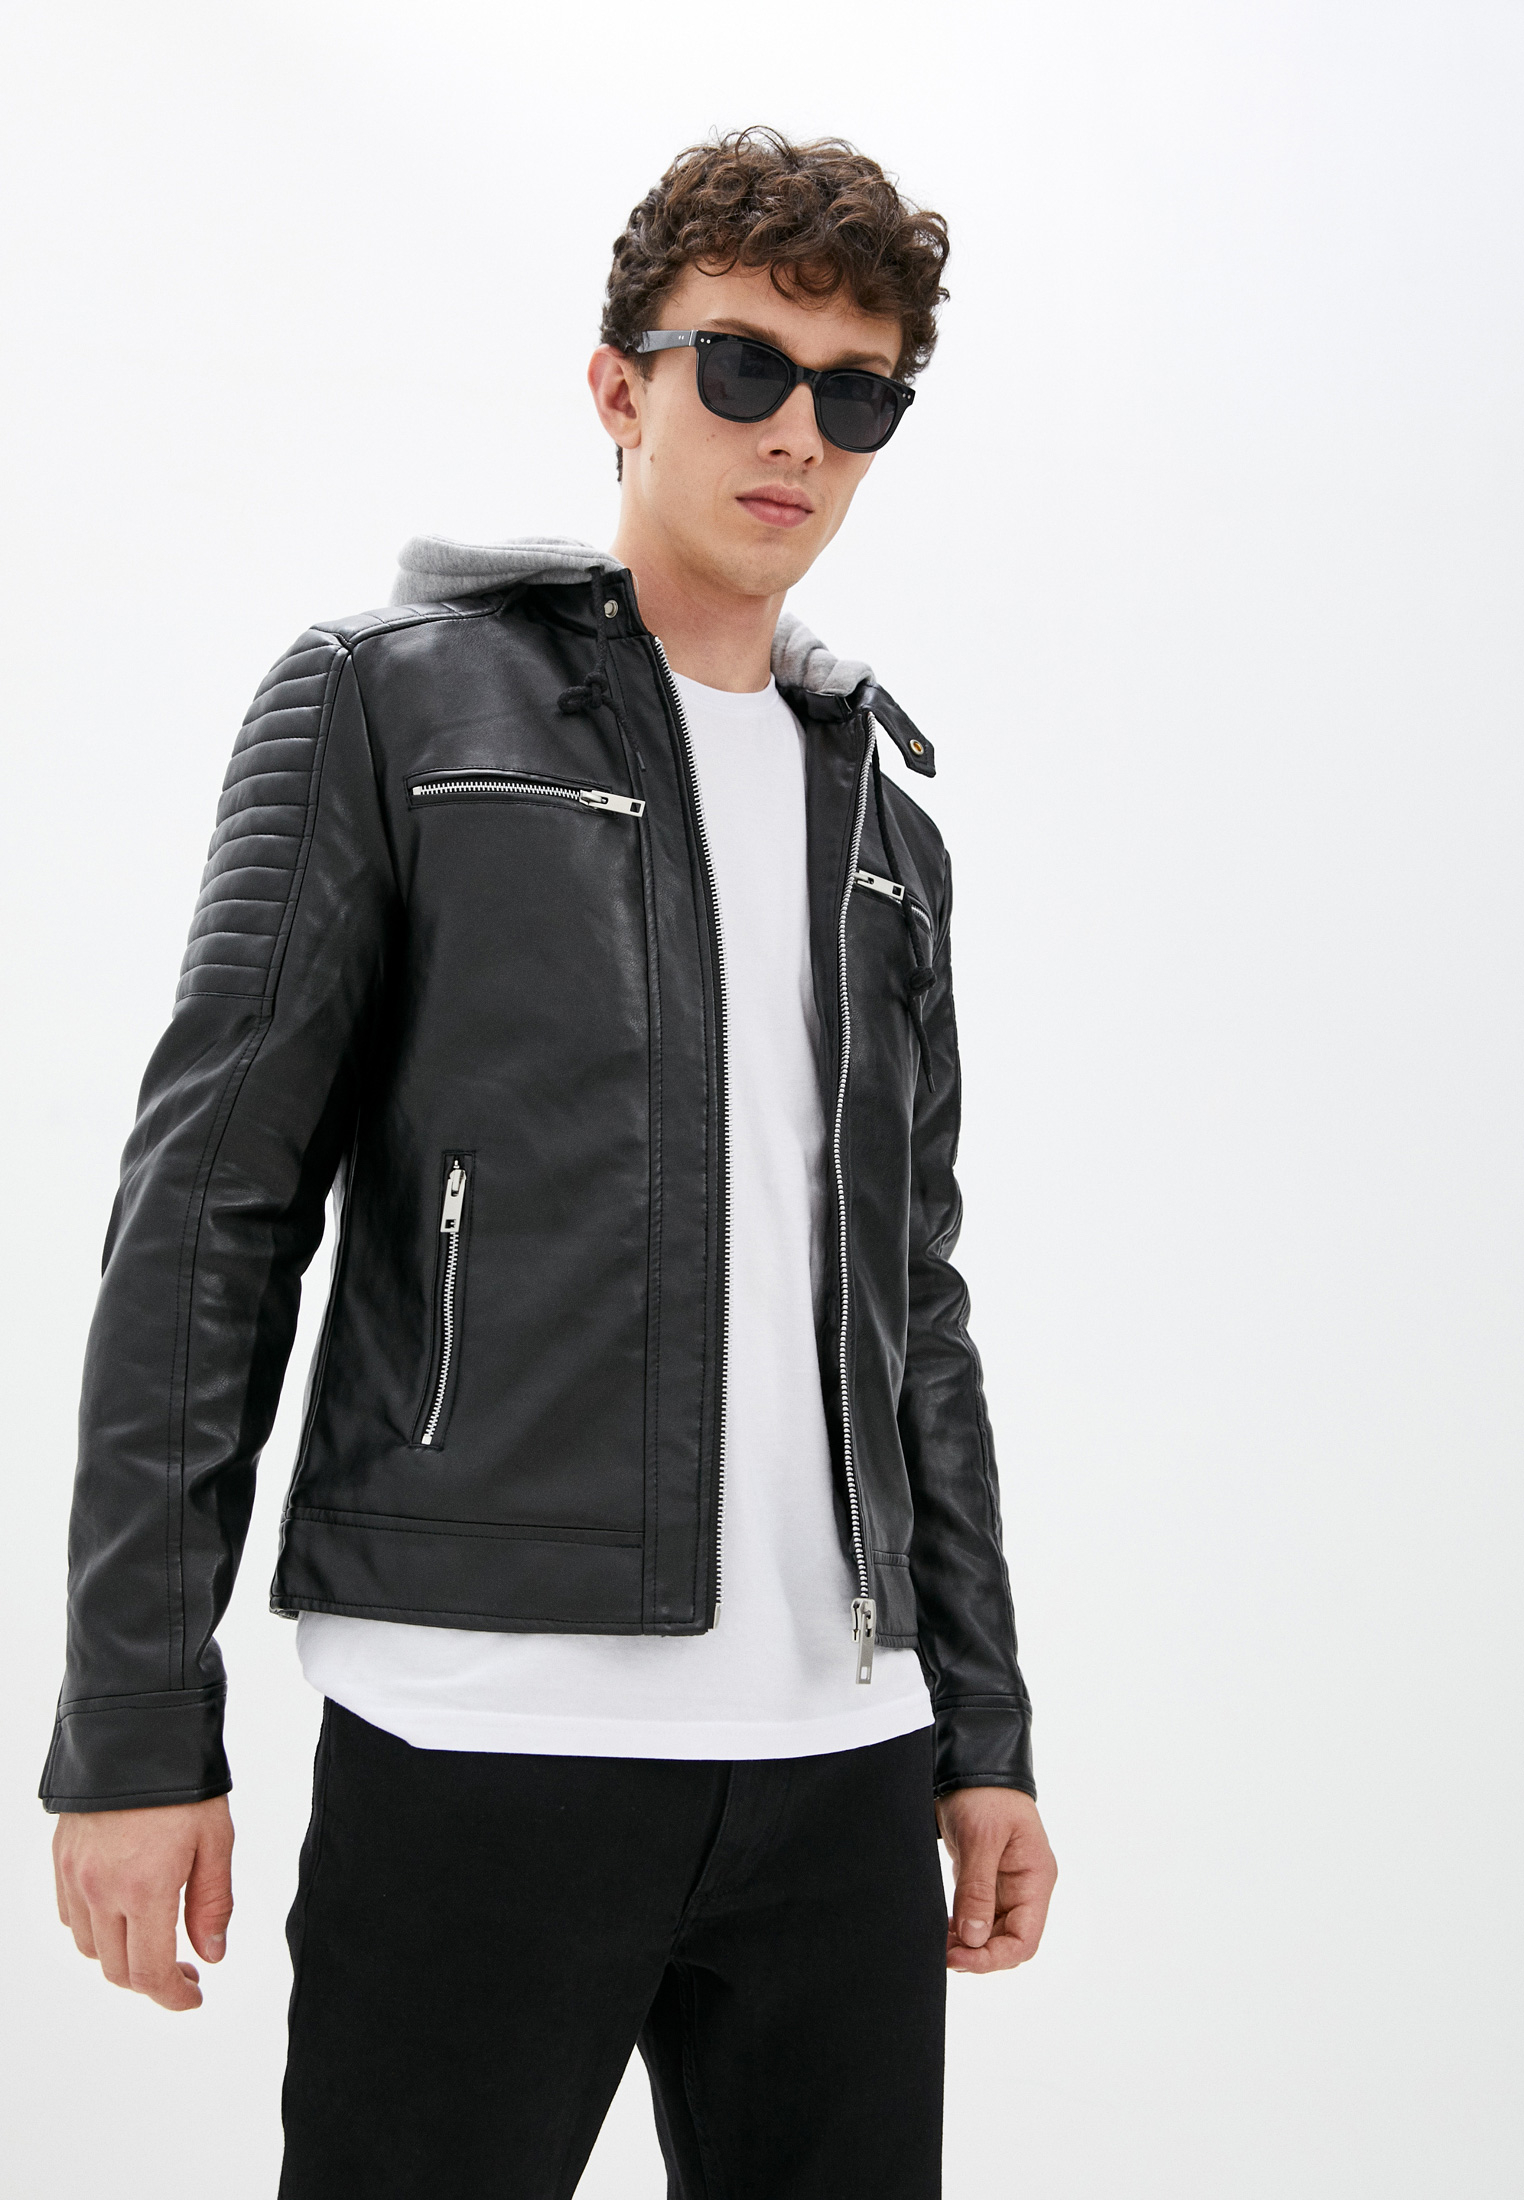 Кожаная куртка Terance Kole Куртка кожаная Terance Kole